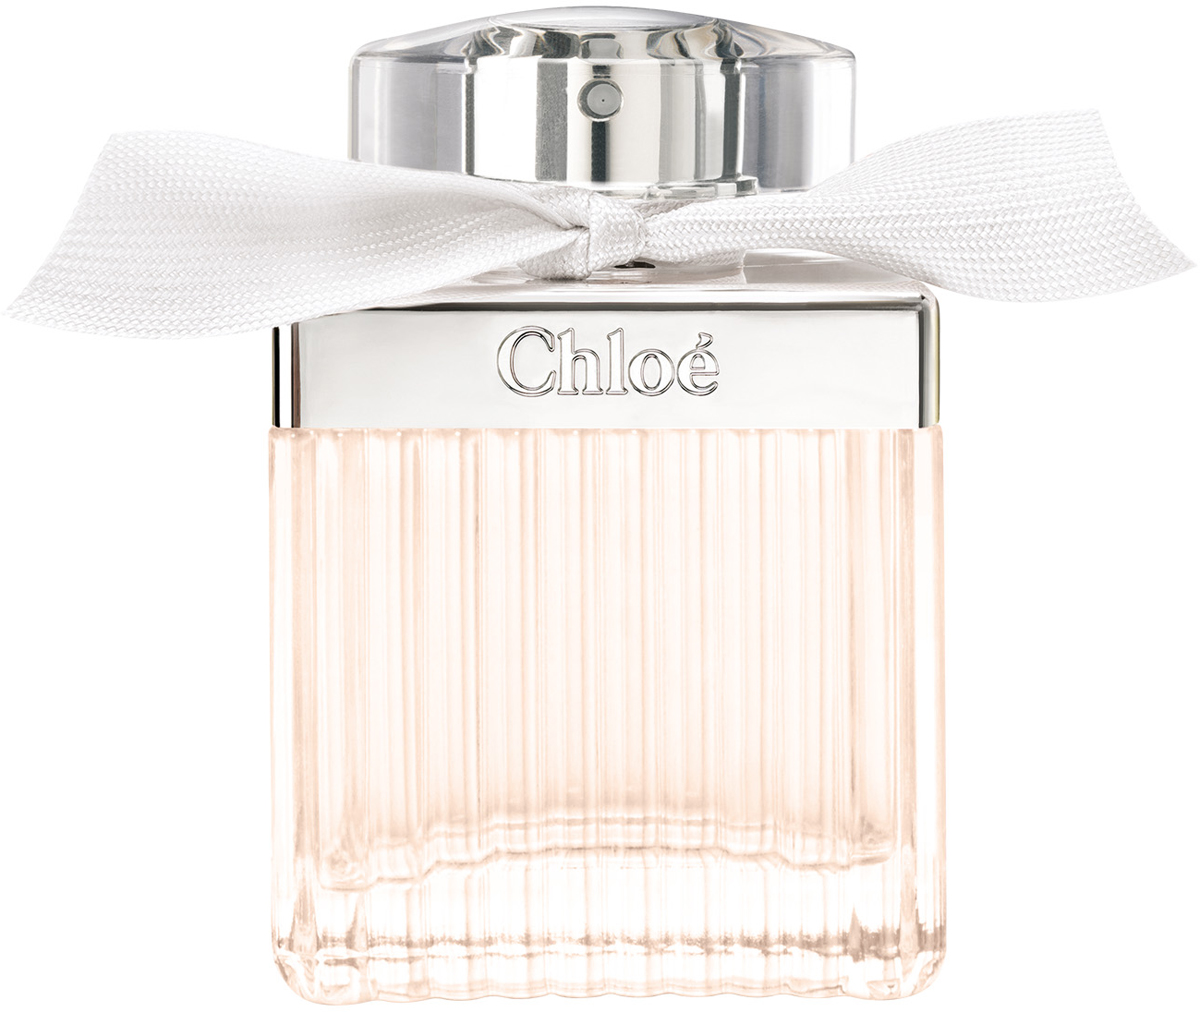 Chloe Signature Туалетная вода женская 75 мл парфюмированная вода для женщин chloe love story 75 мл